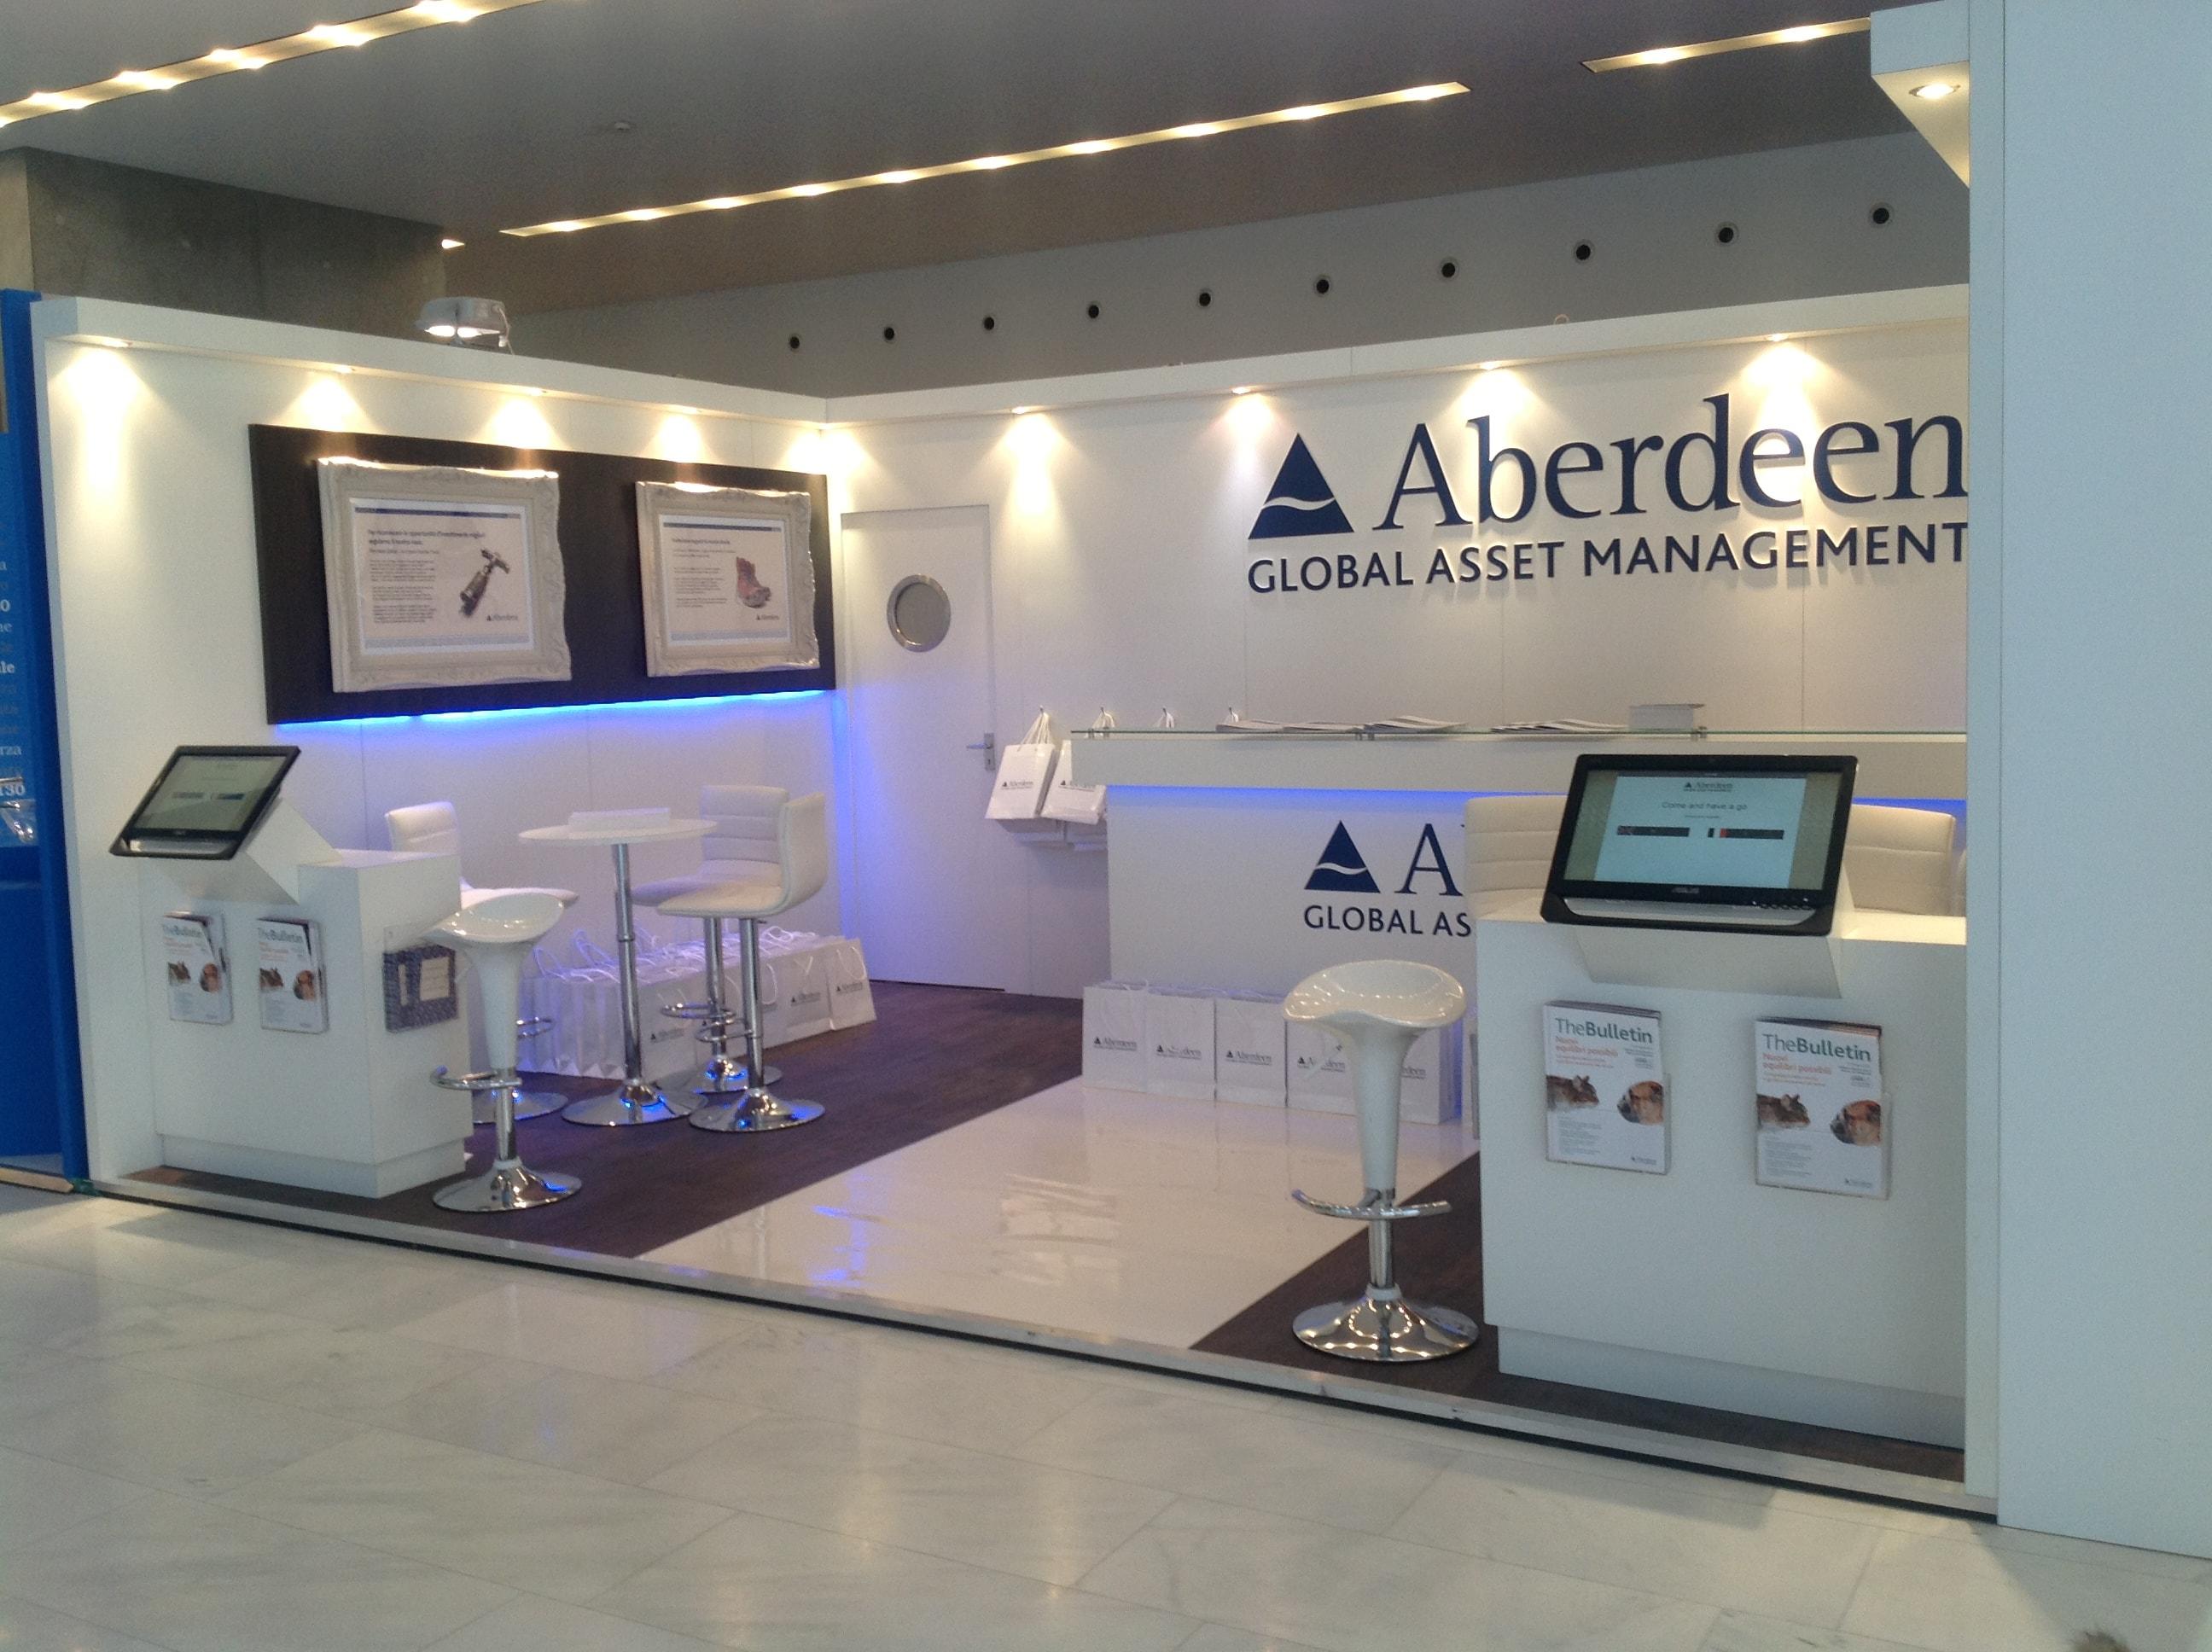 Exhibition Stand Design Aberdeen : Aberdeen global asset management milan display stand